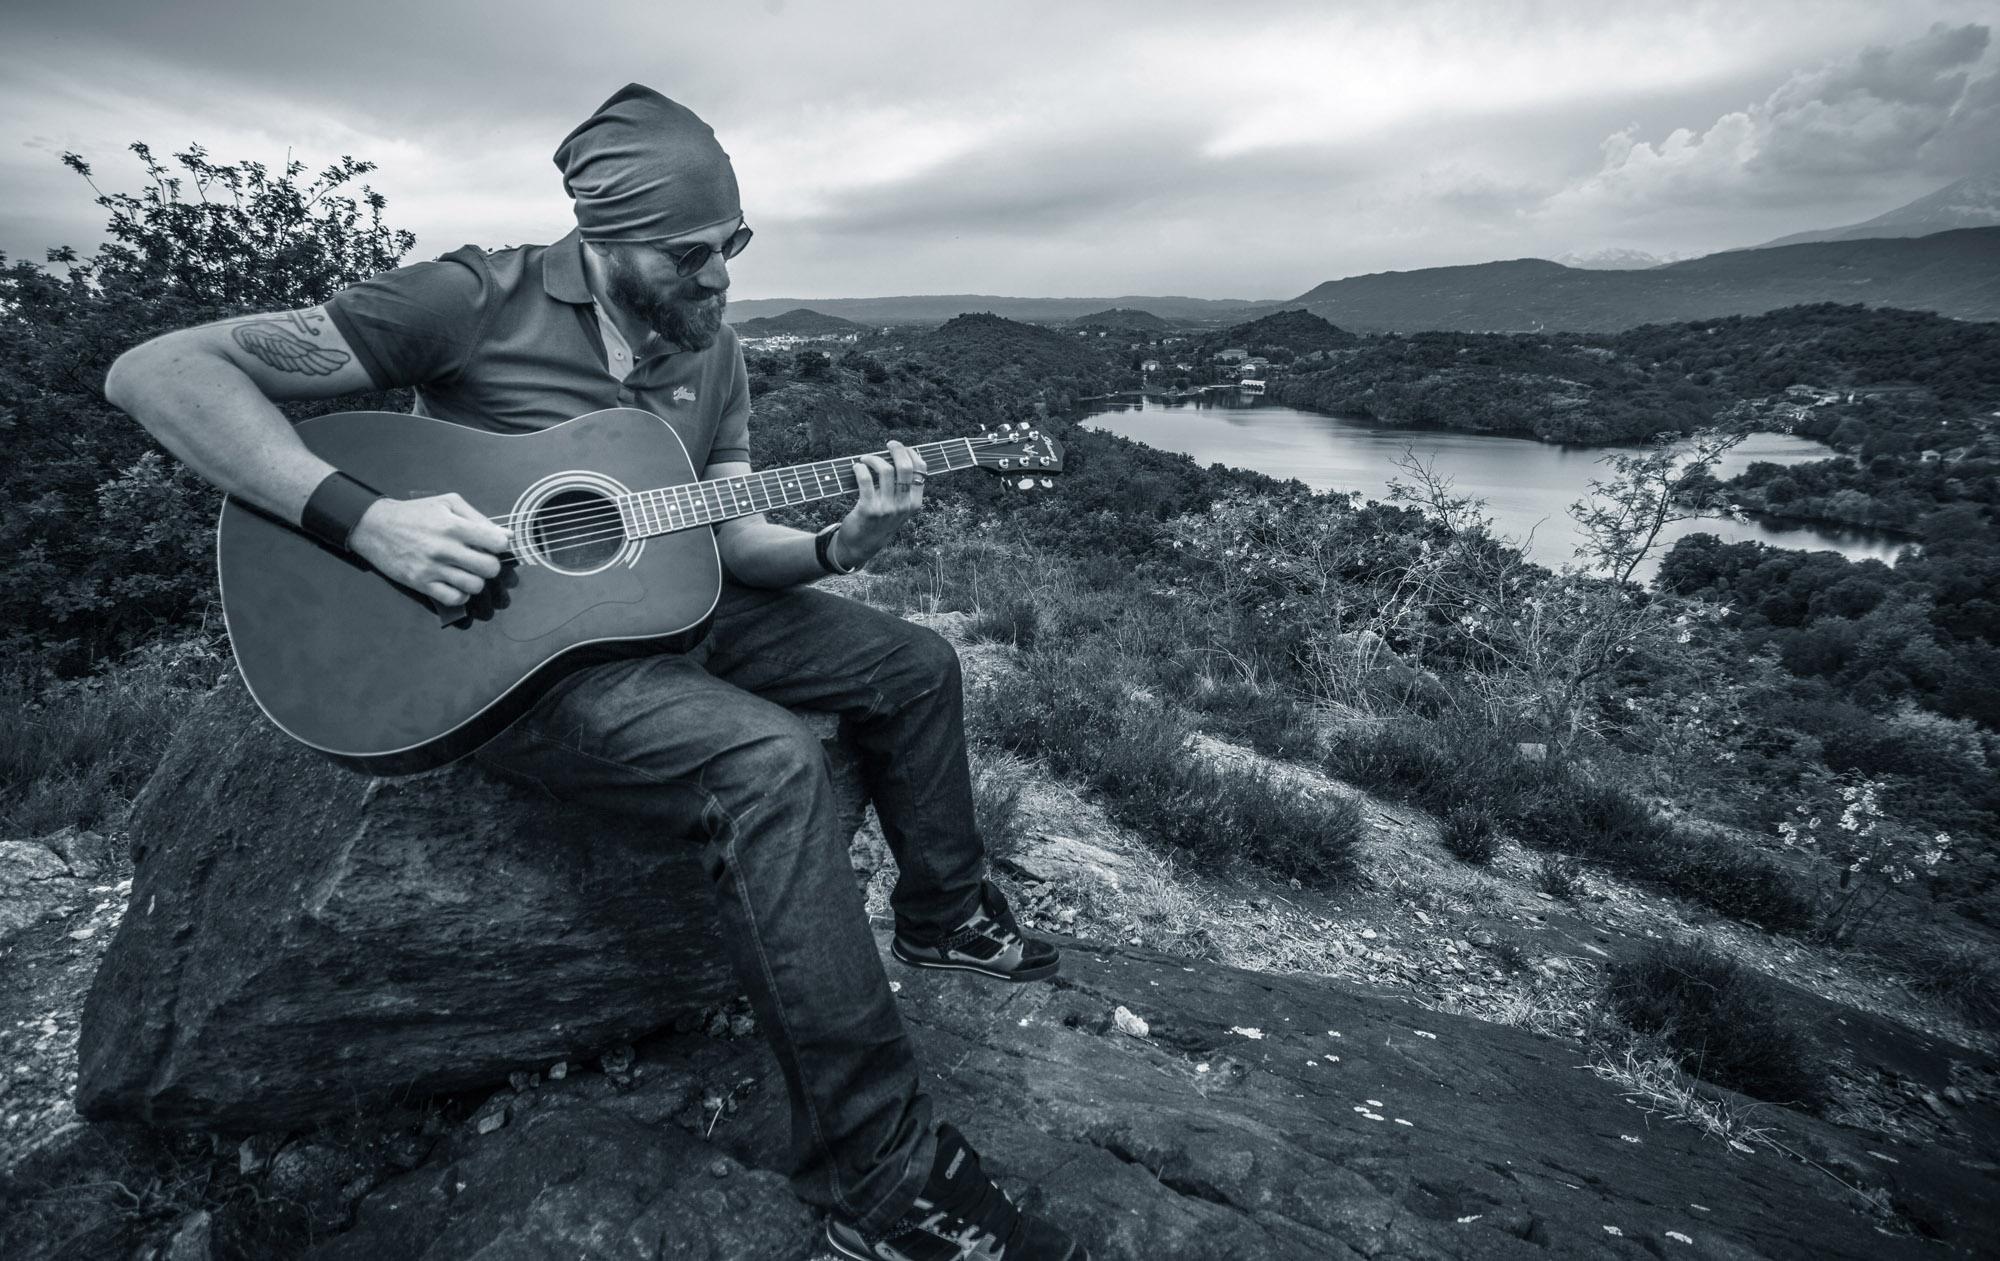 osamělý kytarista